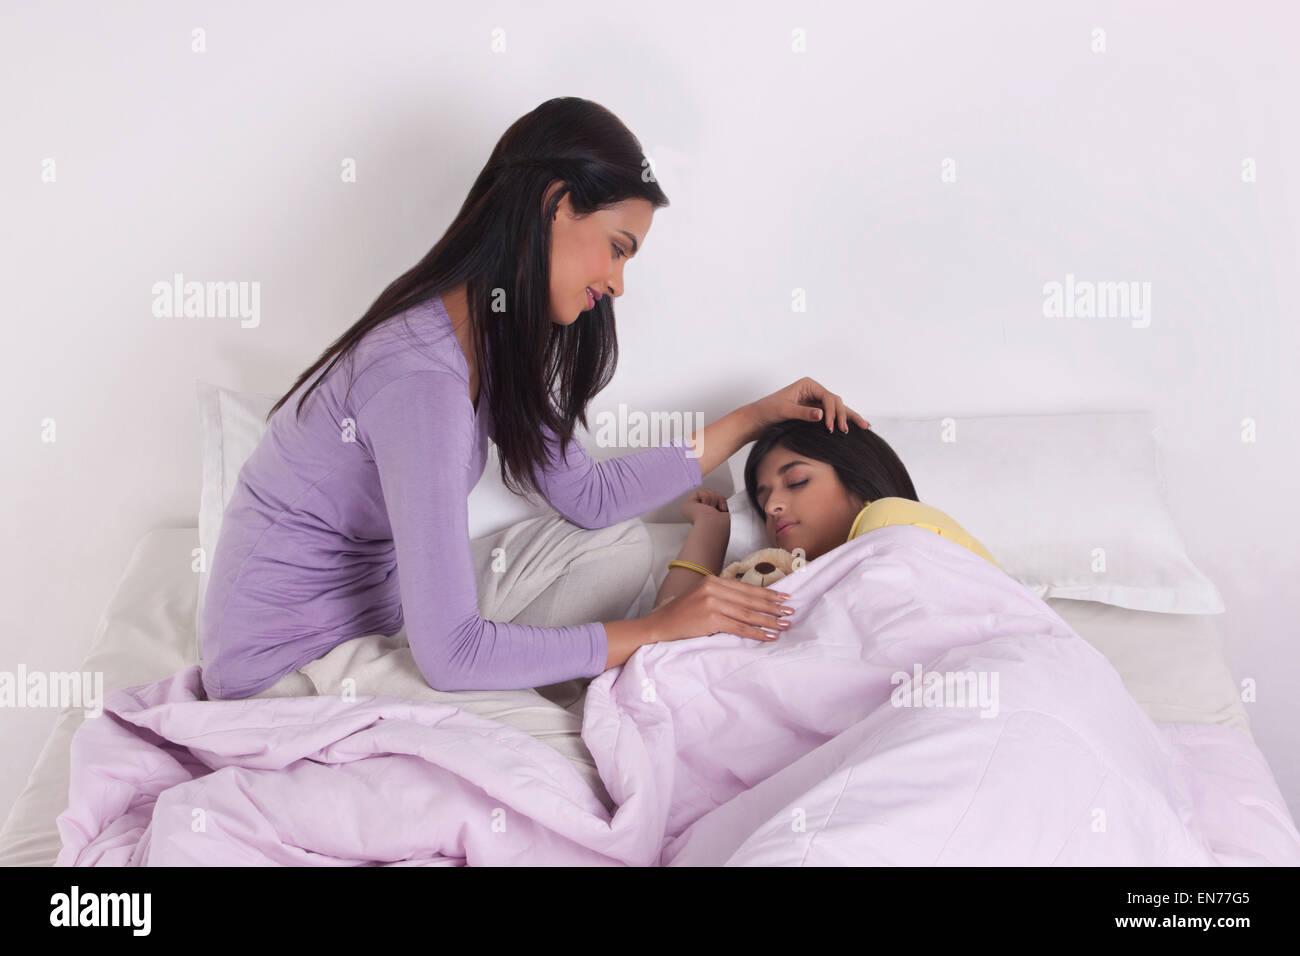 Elder sister watching younger sister sleeping - Stock Image